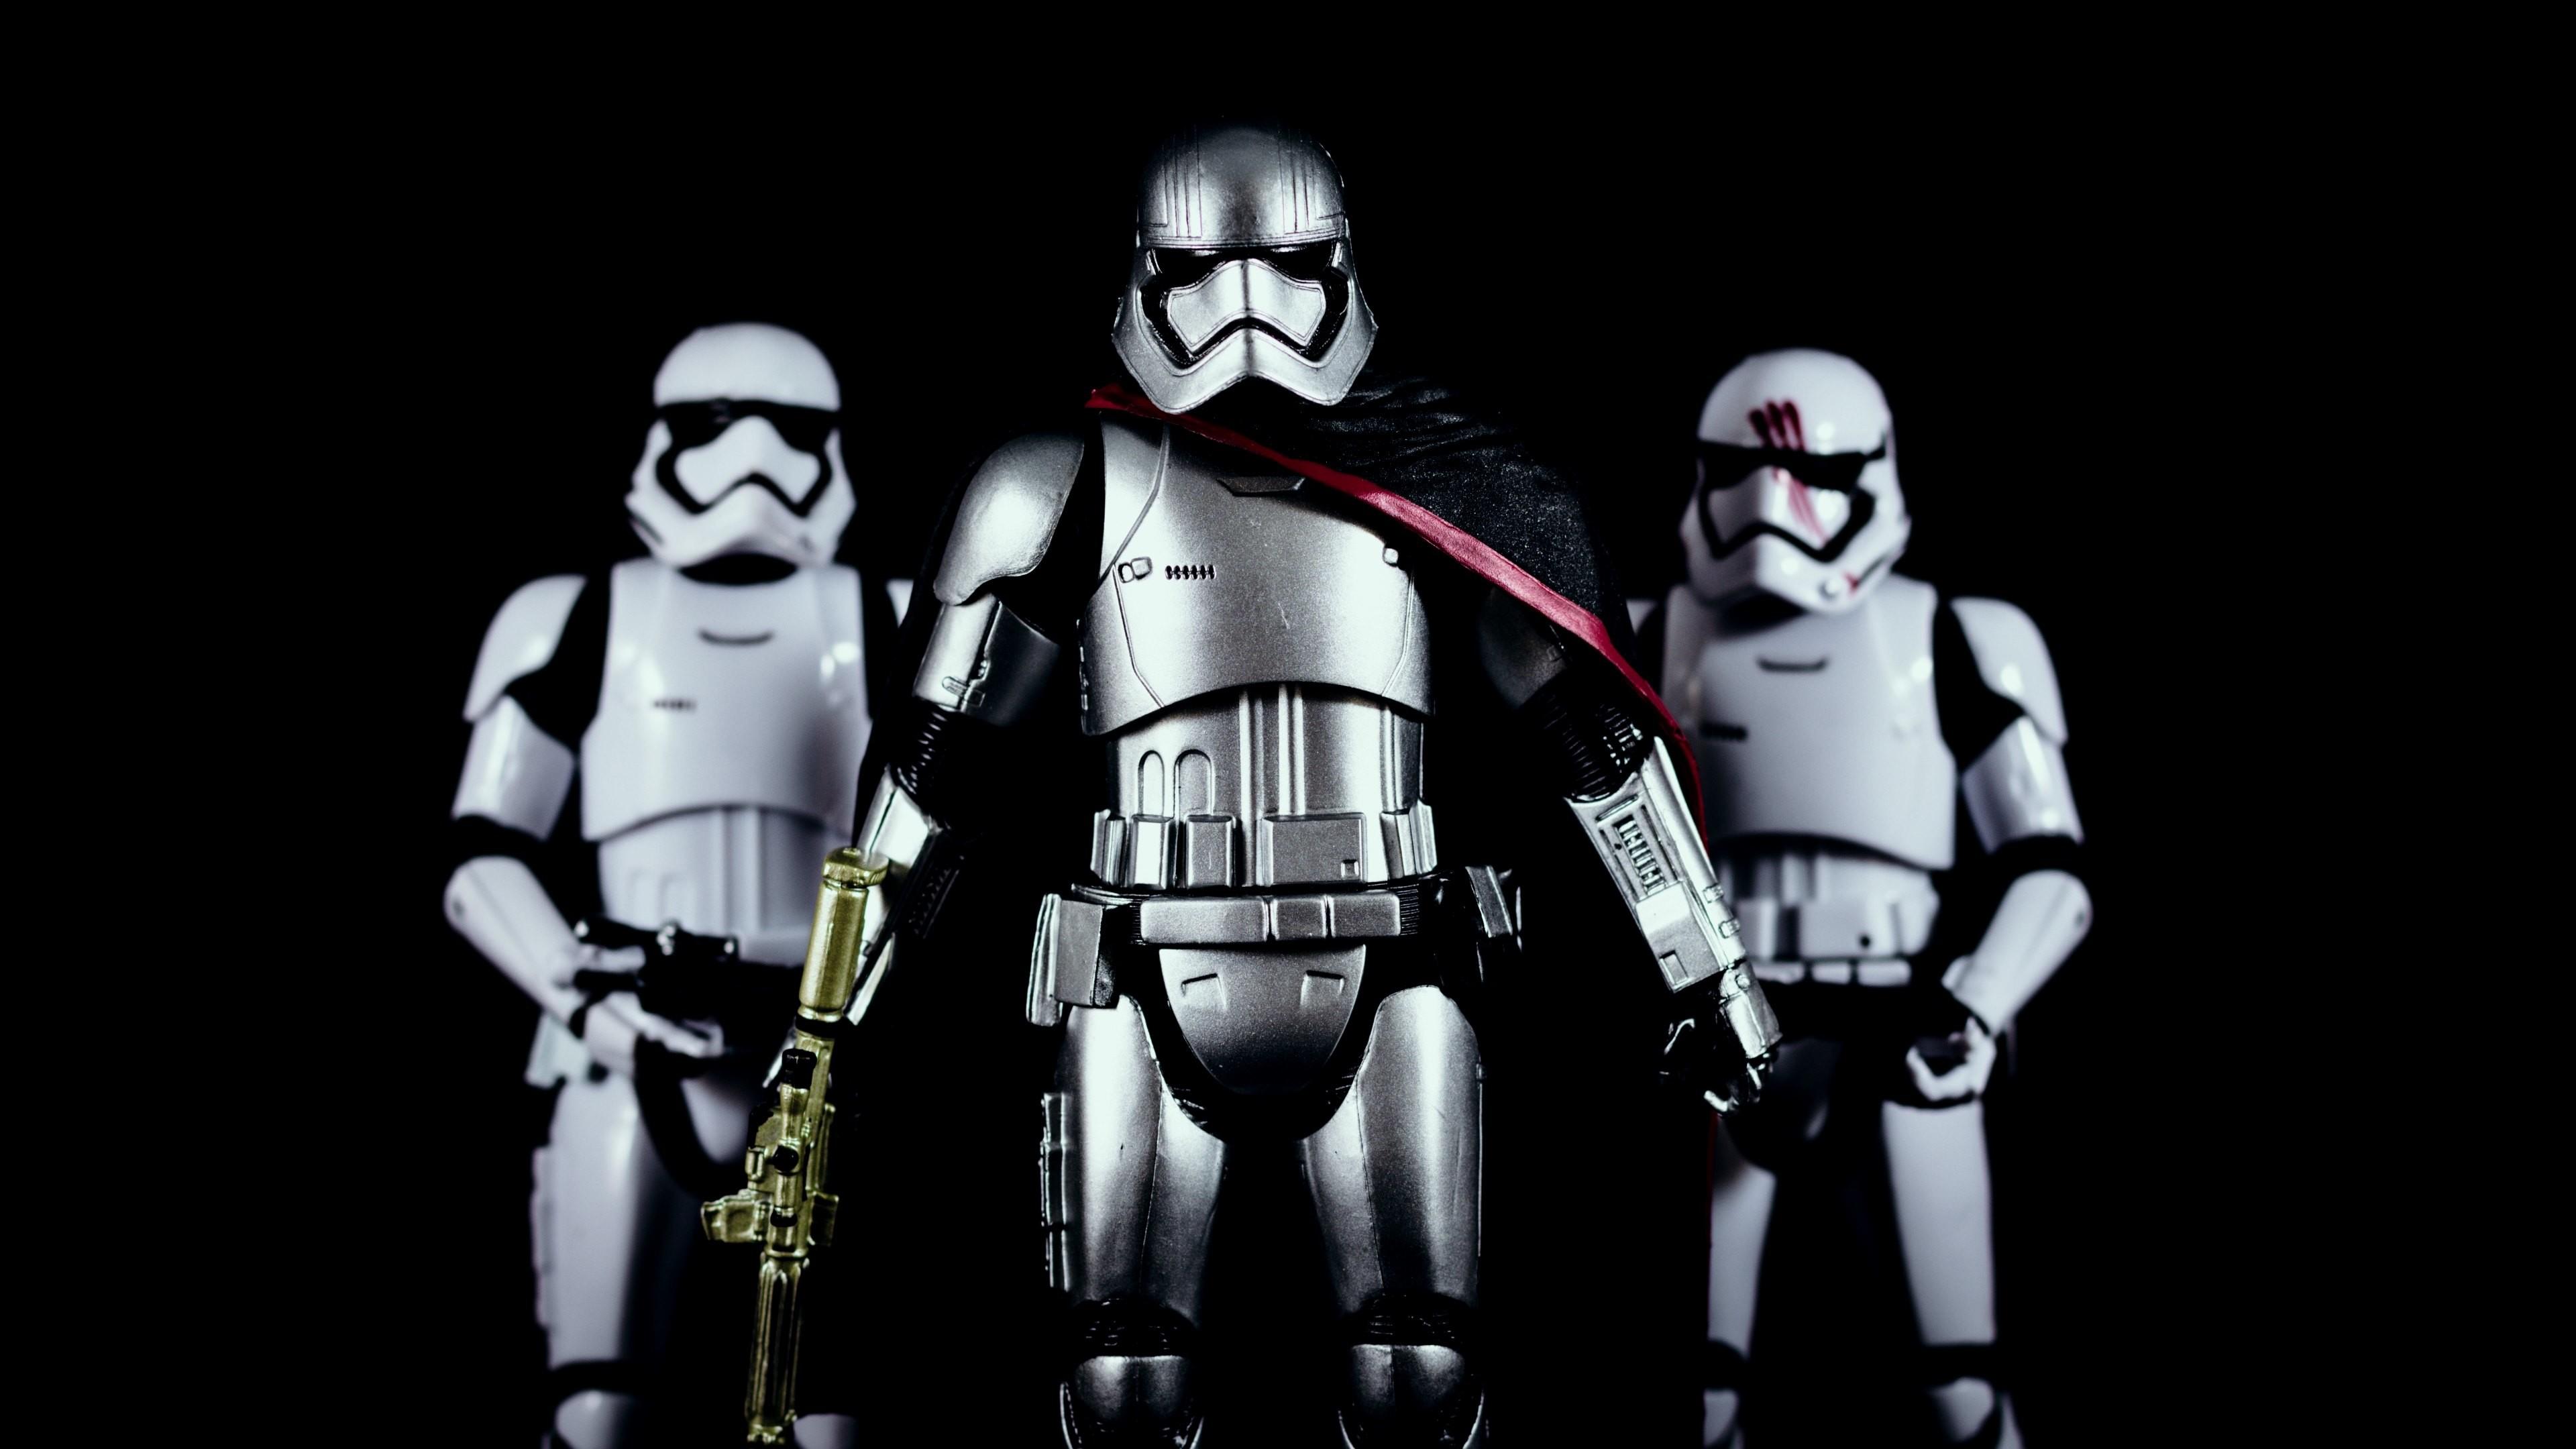 Star Wars Figurines HD Wallpapers. 4K Wallpapers